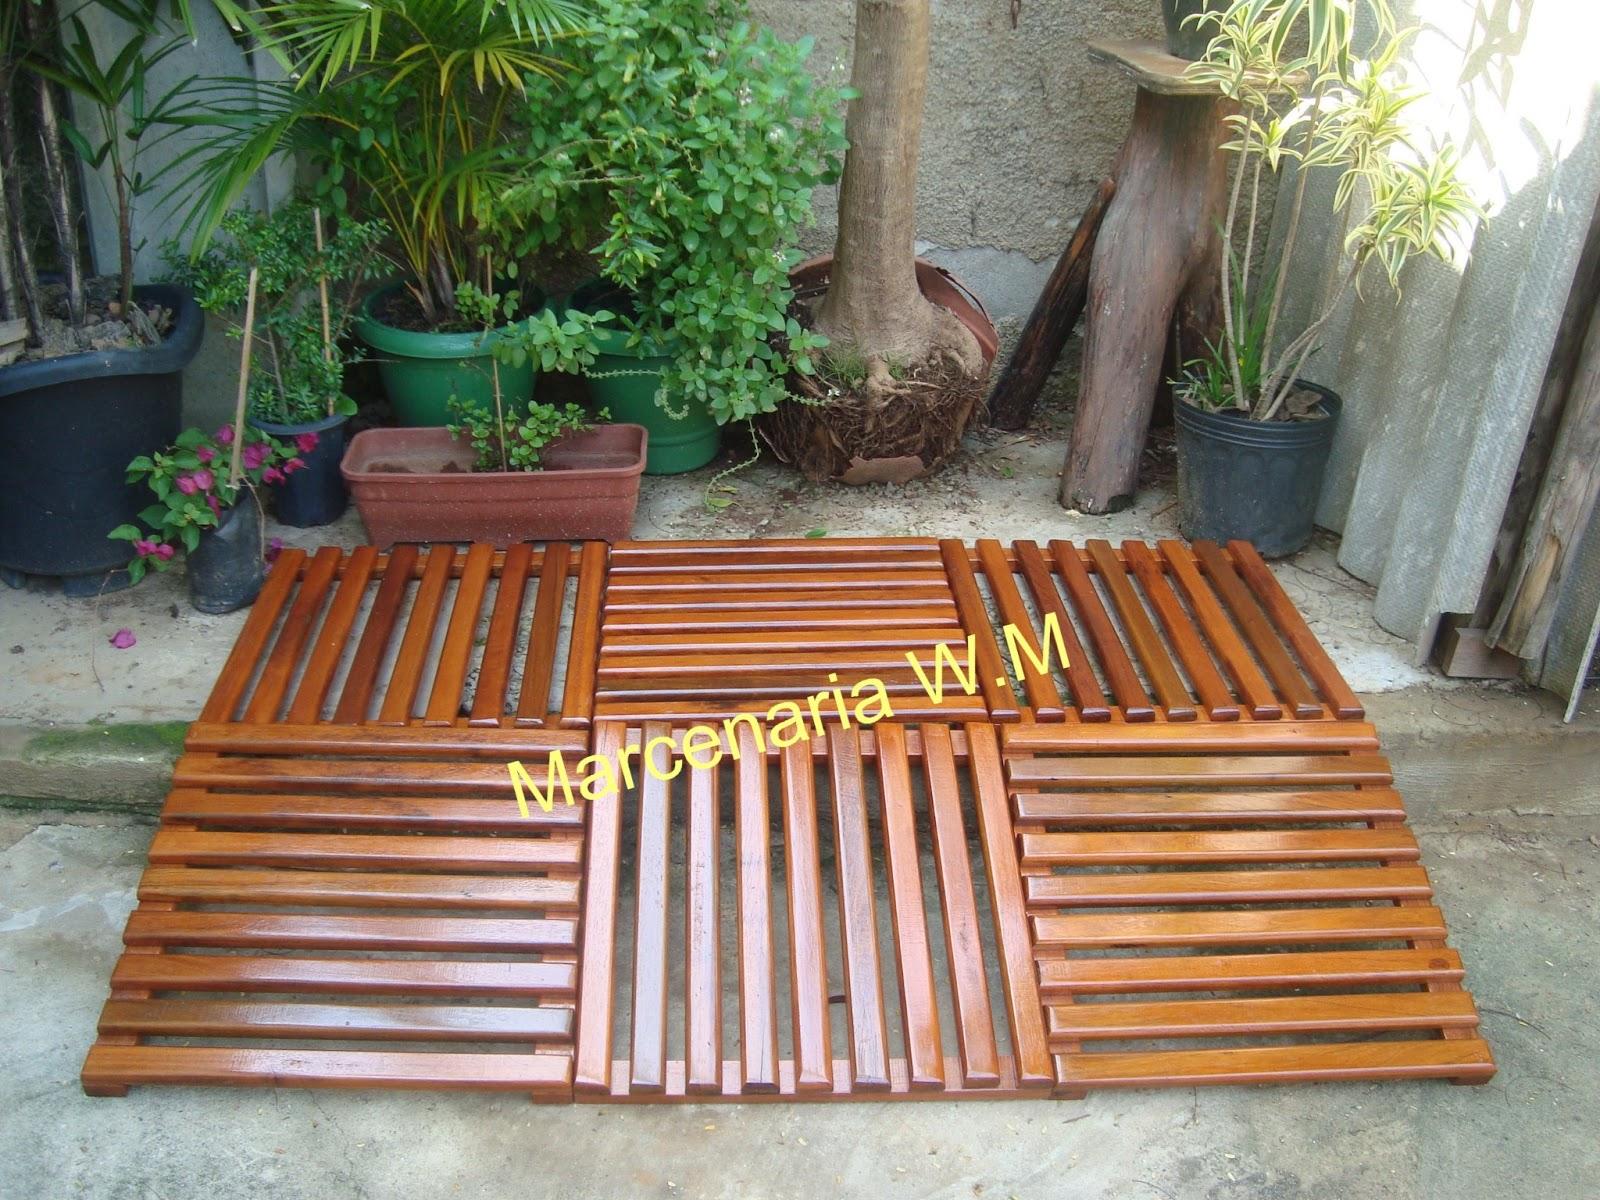 deck jardim sorocaba:Marcenaria – Móveis Planejados ***: Deck